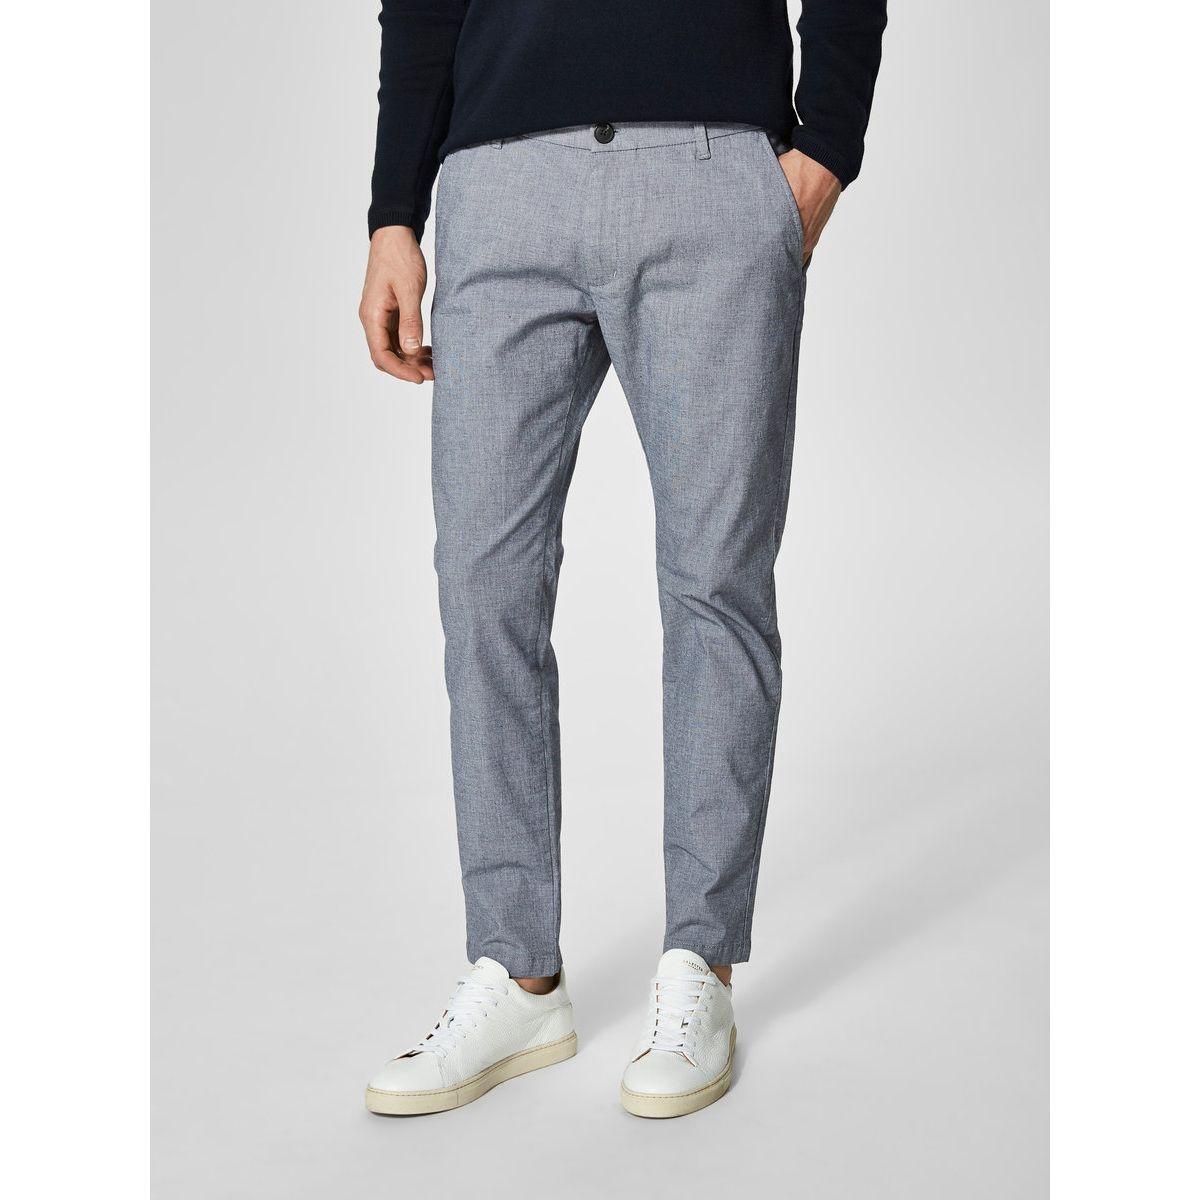 Pantalon Slim fit -